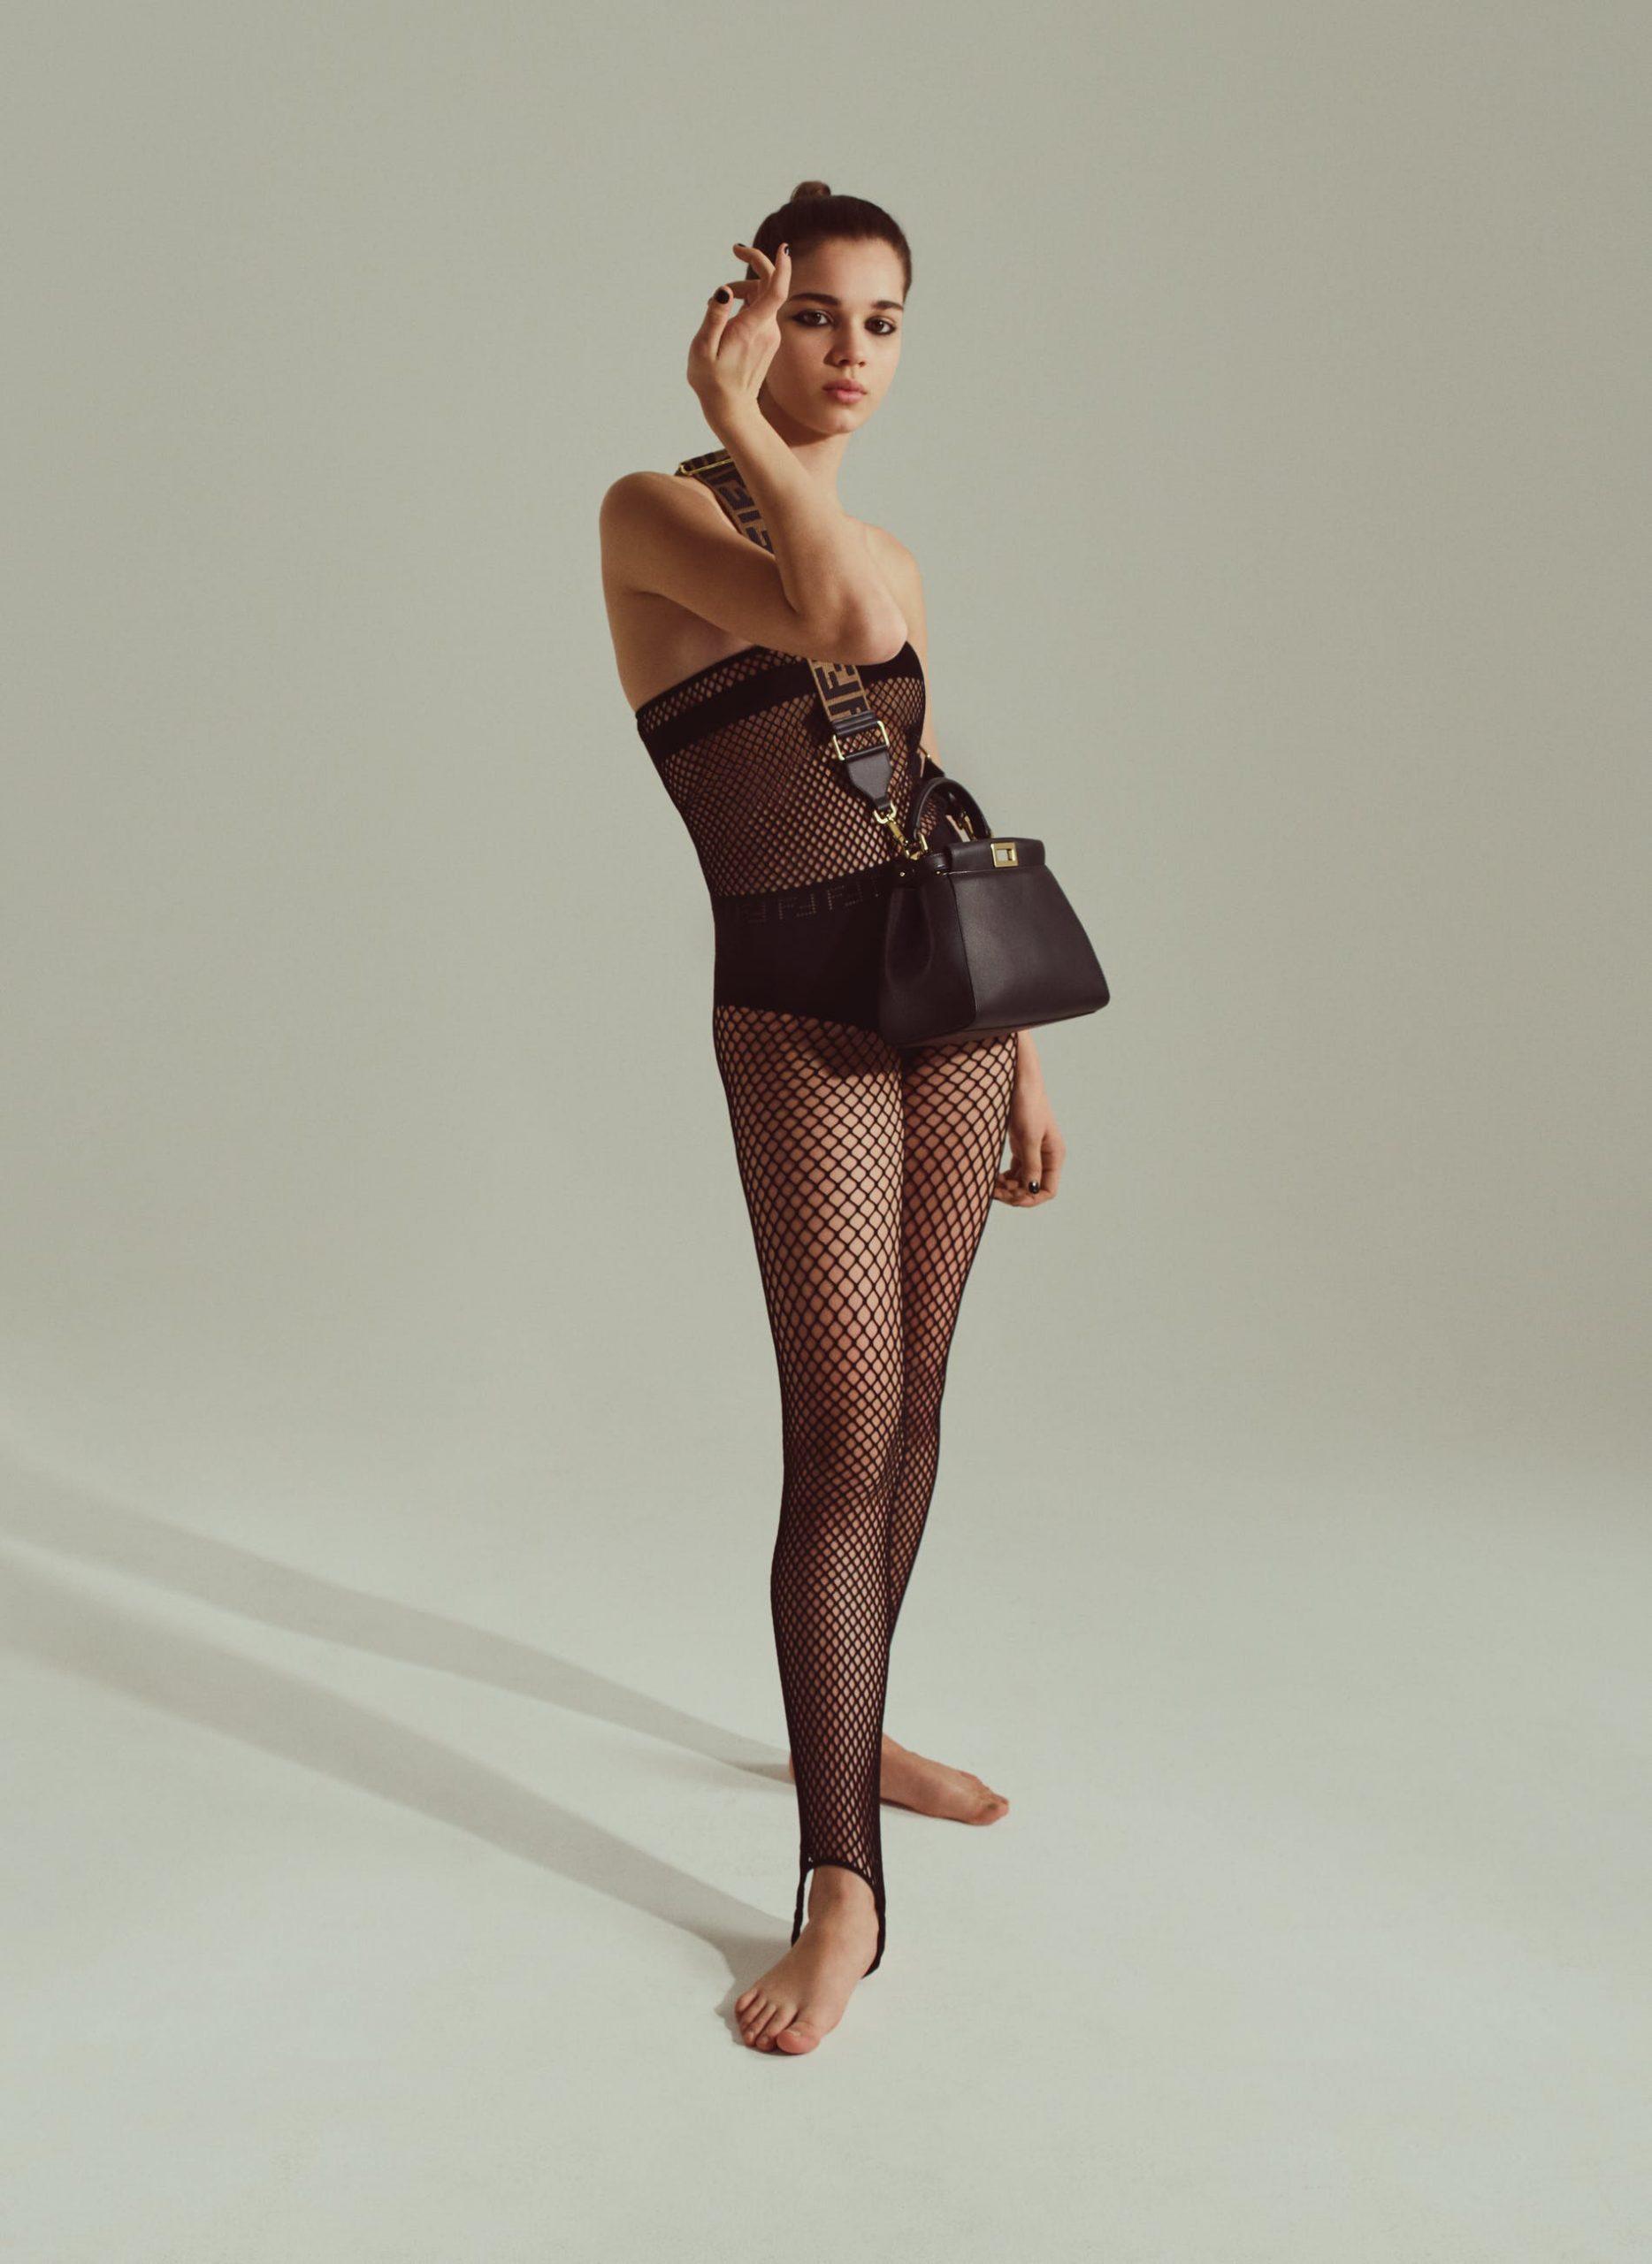 Fendi 'Icons' Spring 2020 Ad Campaign Photos